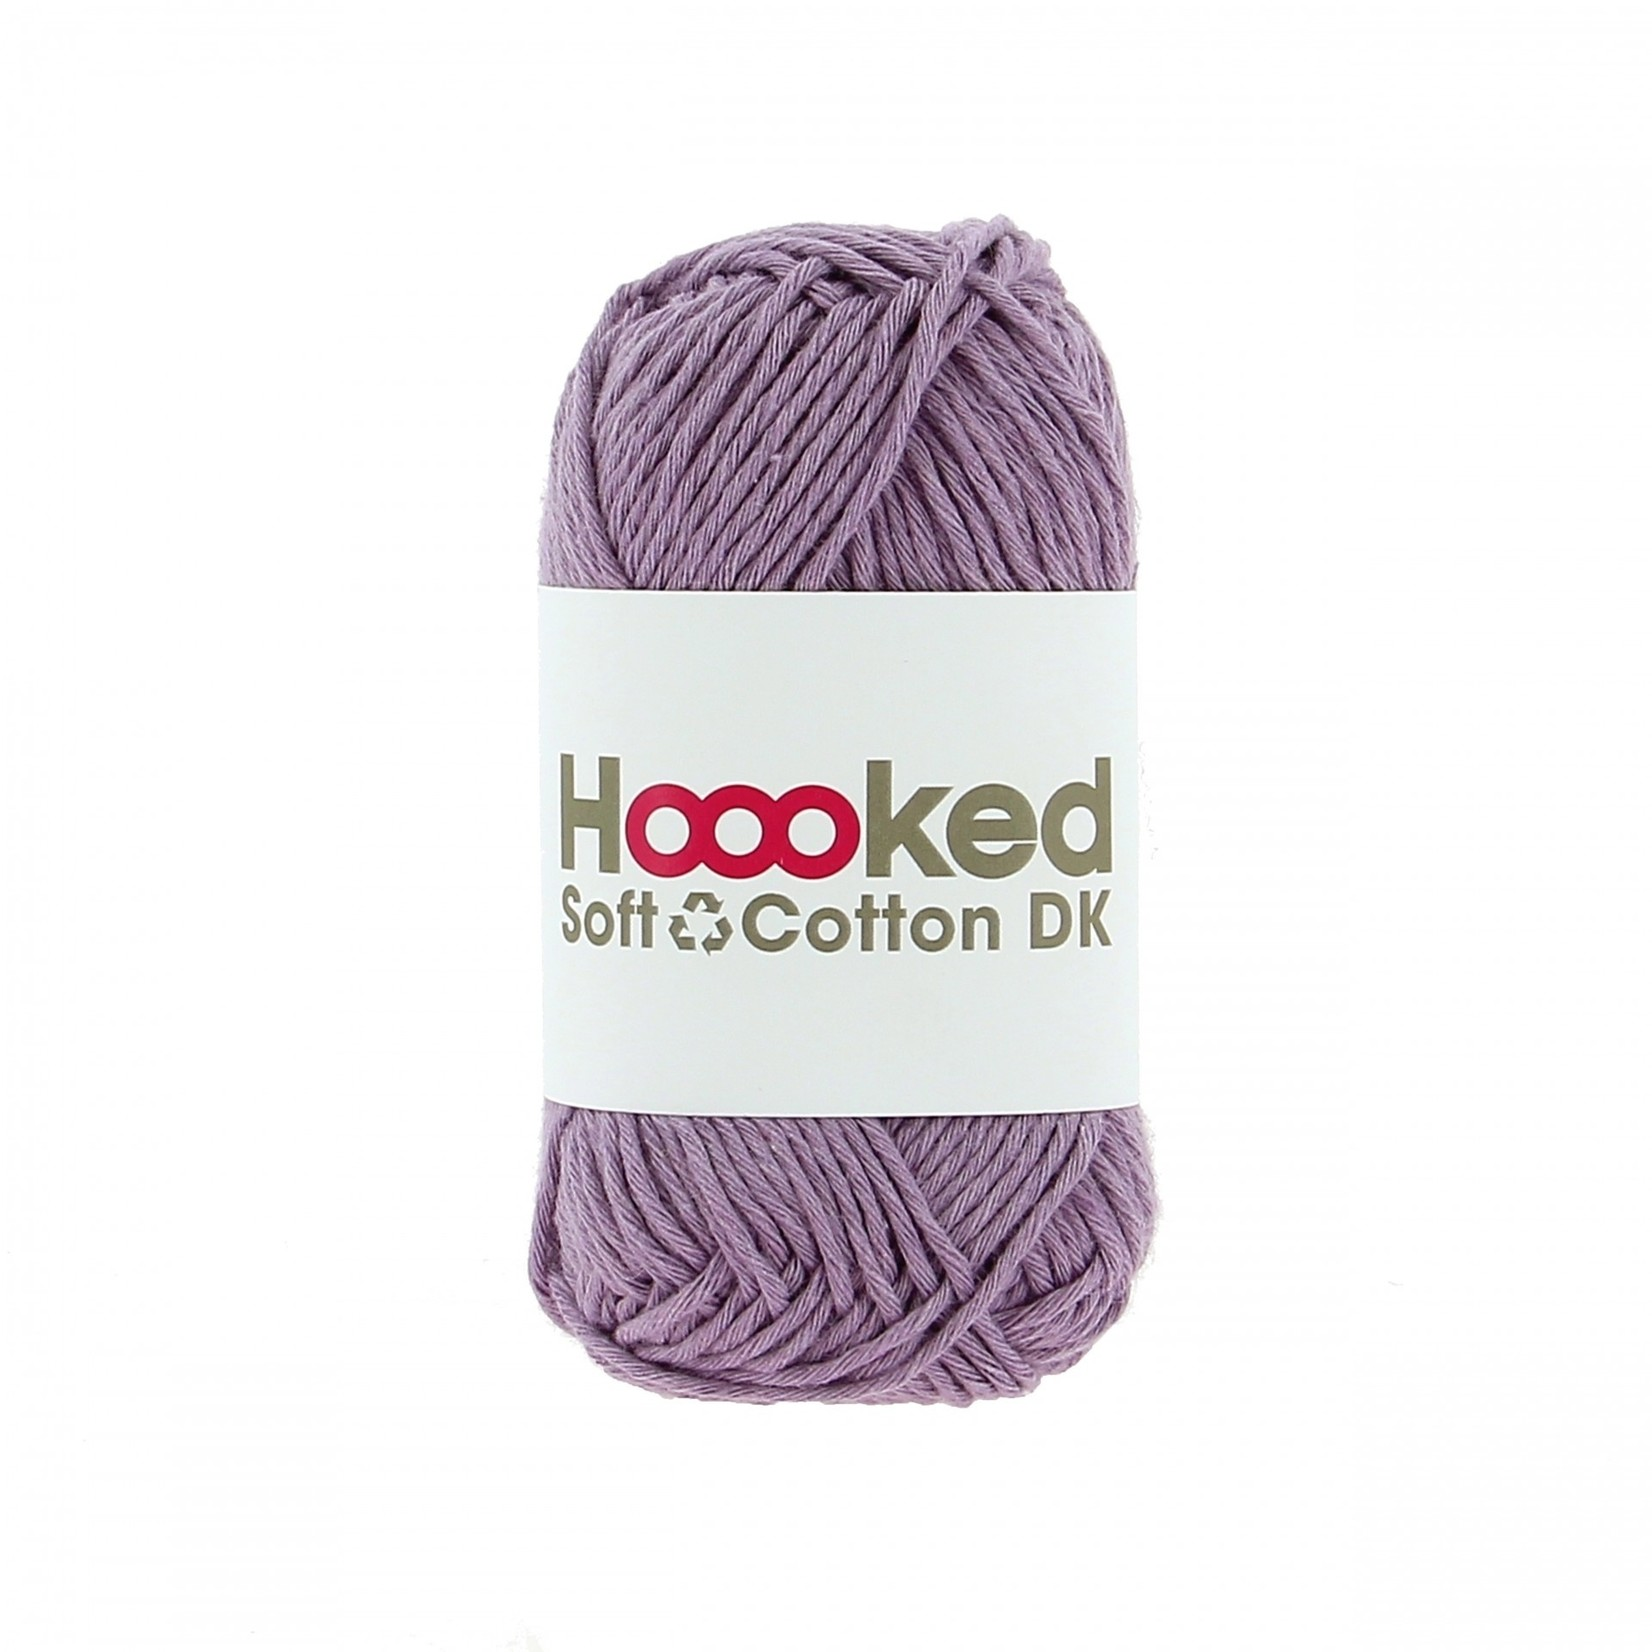 Hoooked HoookedSoft Cotton DK Granada Lavender bundel 5 x 50 gr. / 85 m.